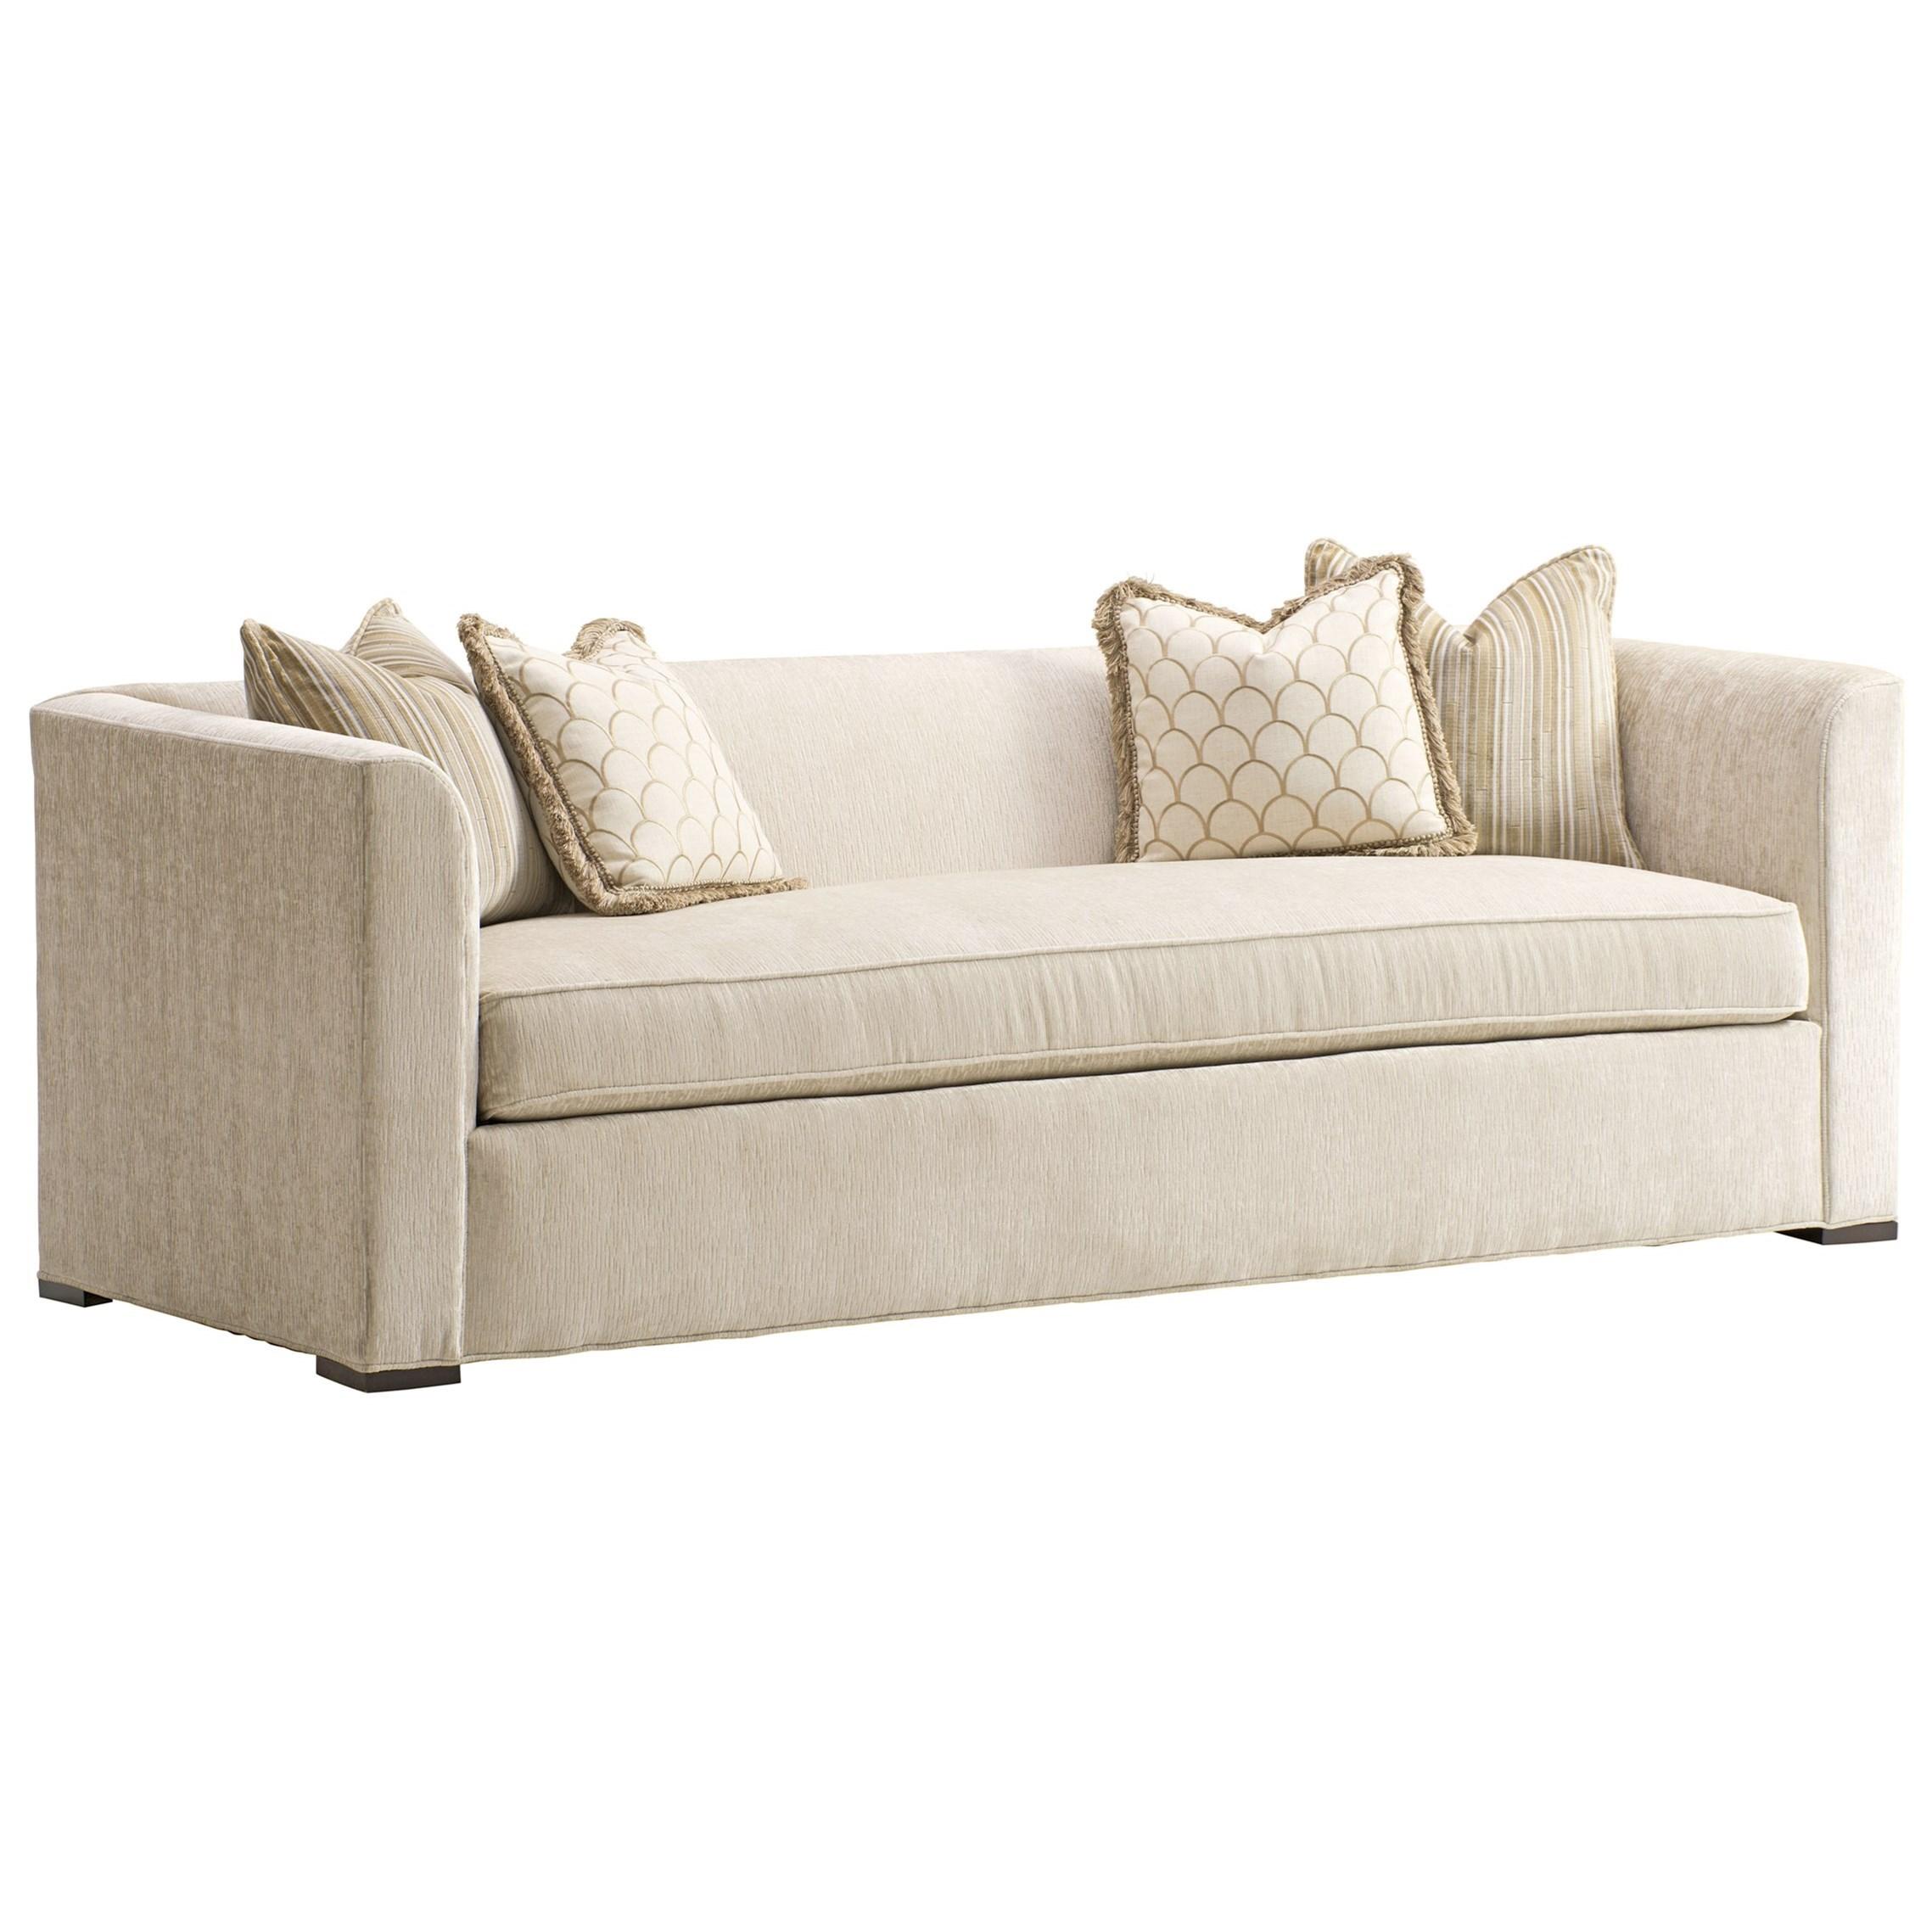 Carlyle Gotham Sofa by Lexington at Baer's Furniture